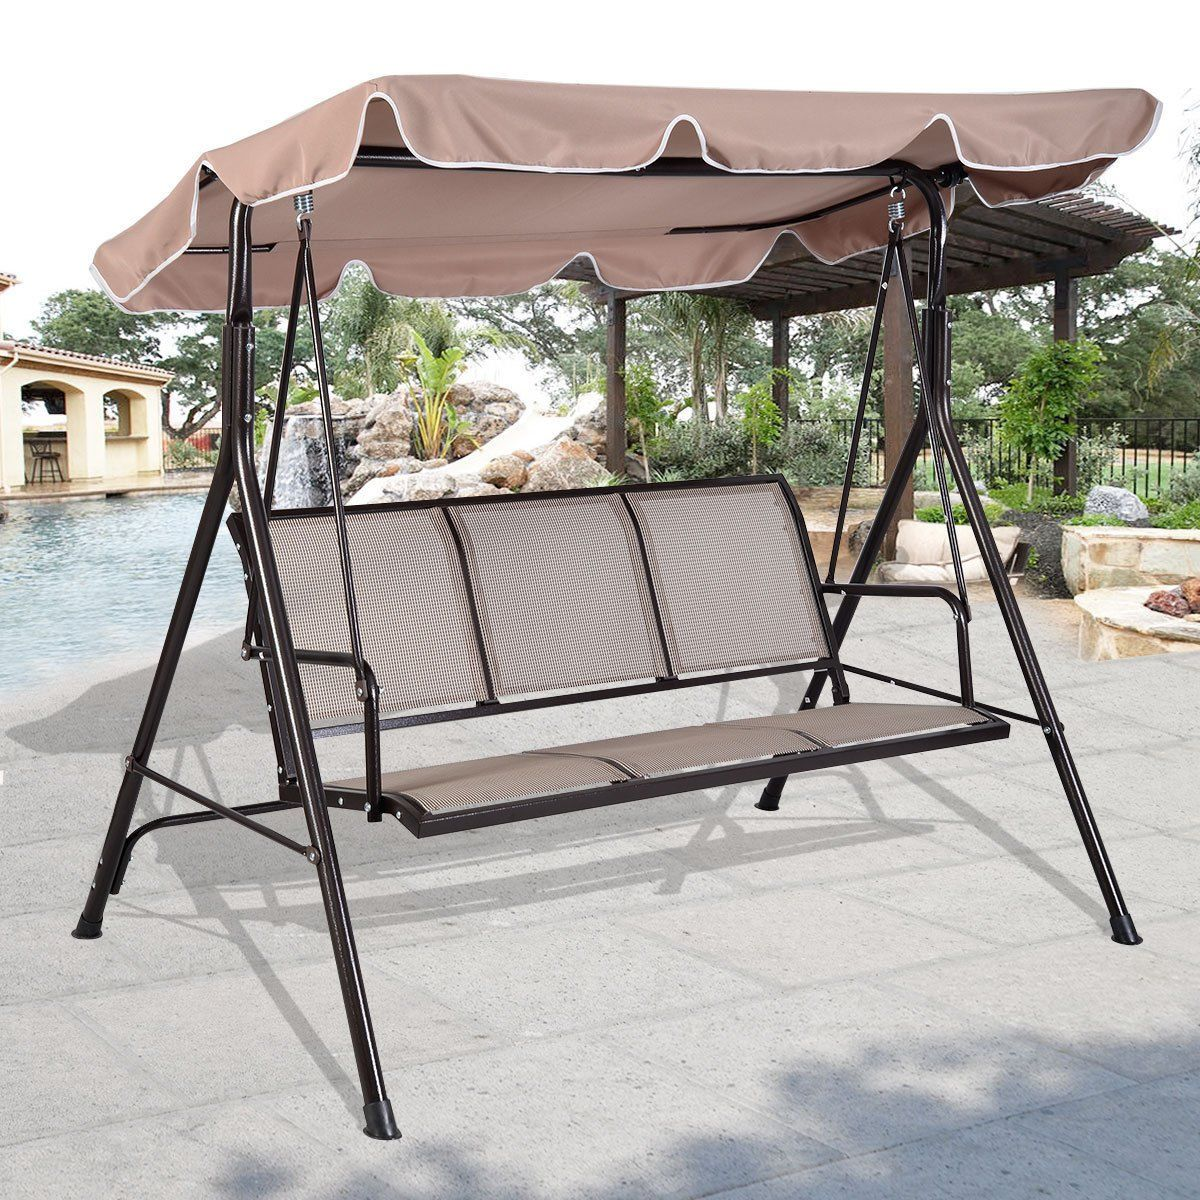 Giantex 3 Person Outdoor Patio Swing Canopy Awning Yard Furniture Hammock  Steel Beige